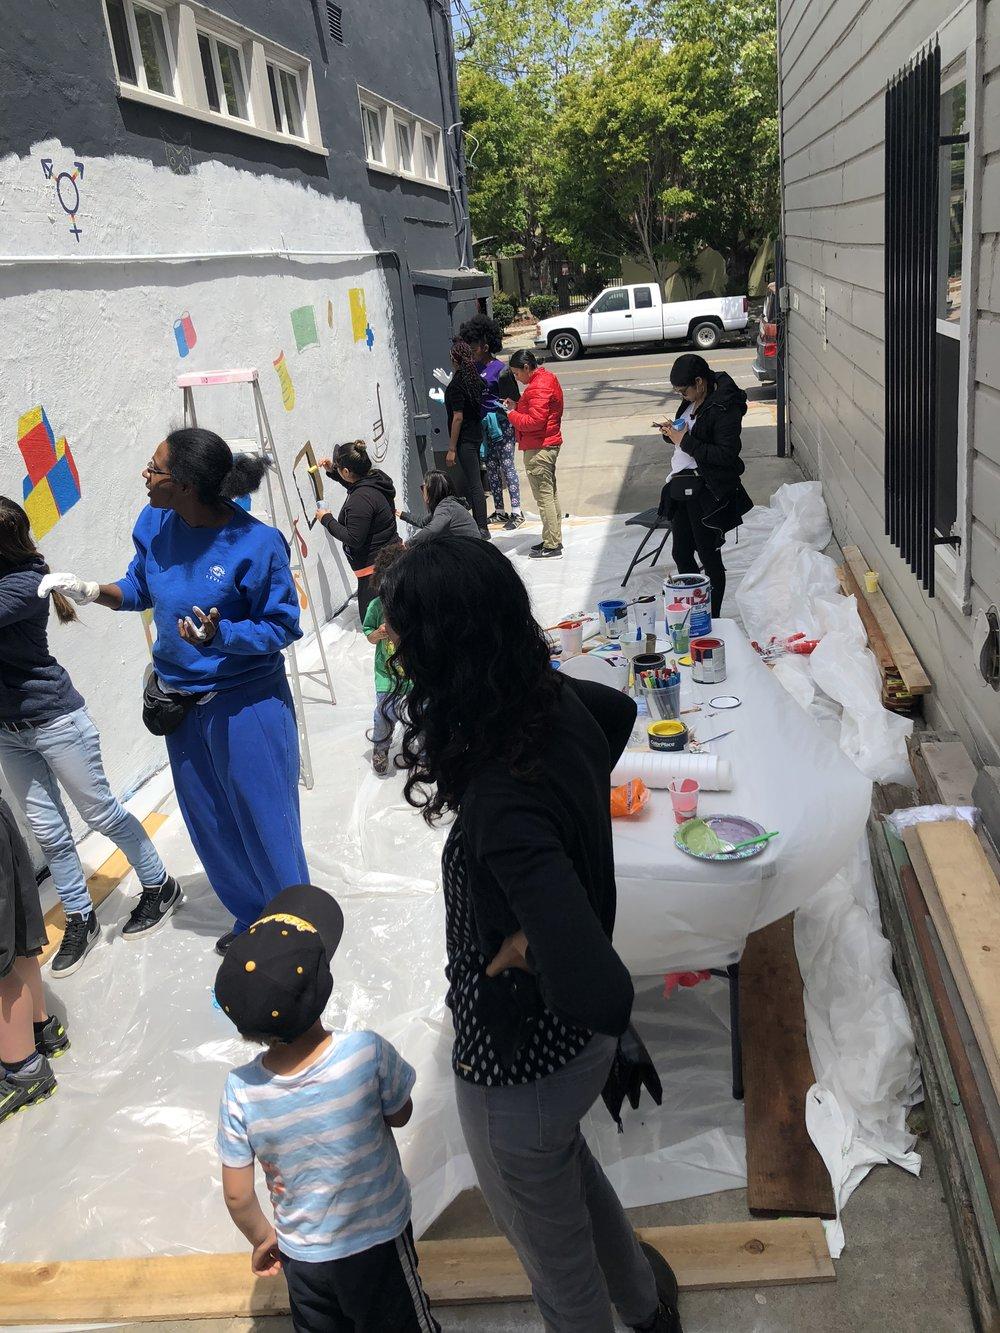 Community Baby Shower and Mural-10.jpg